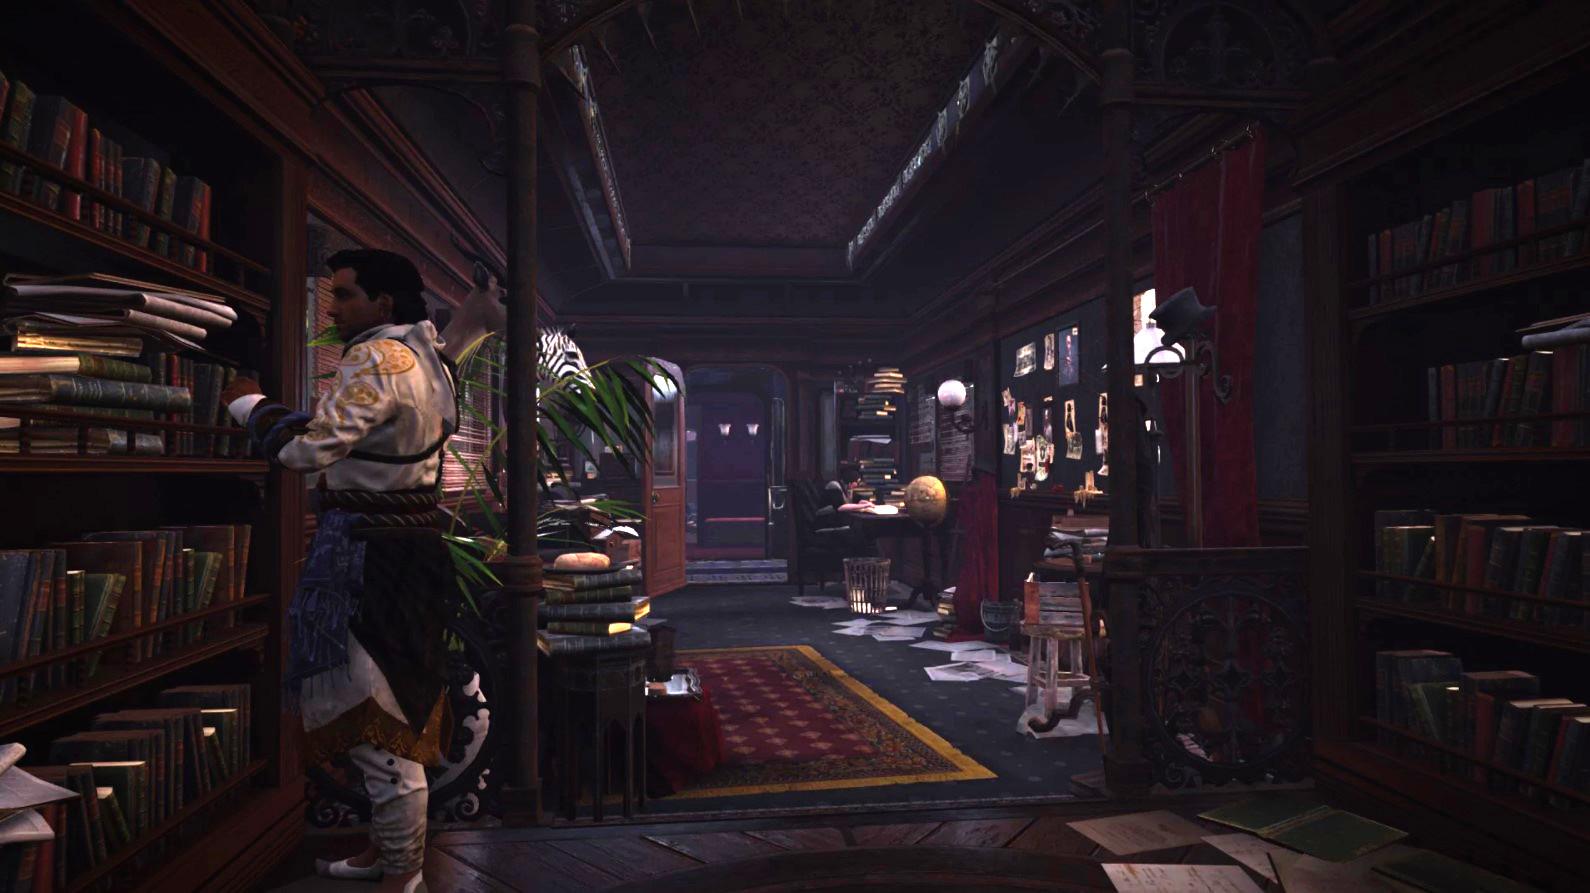 Vincent derozier screenshot 1